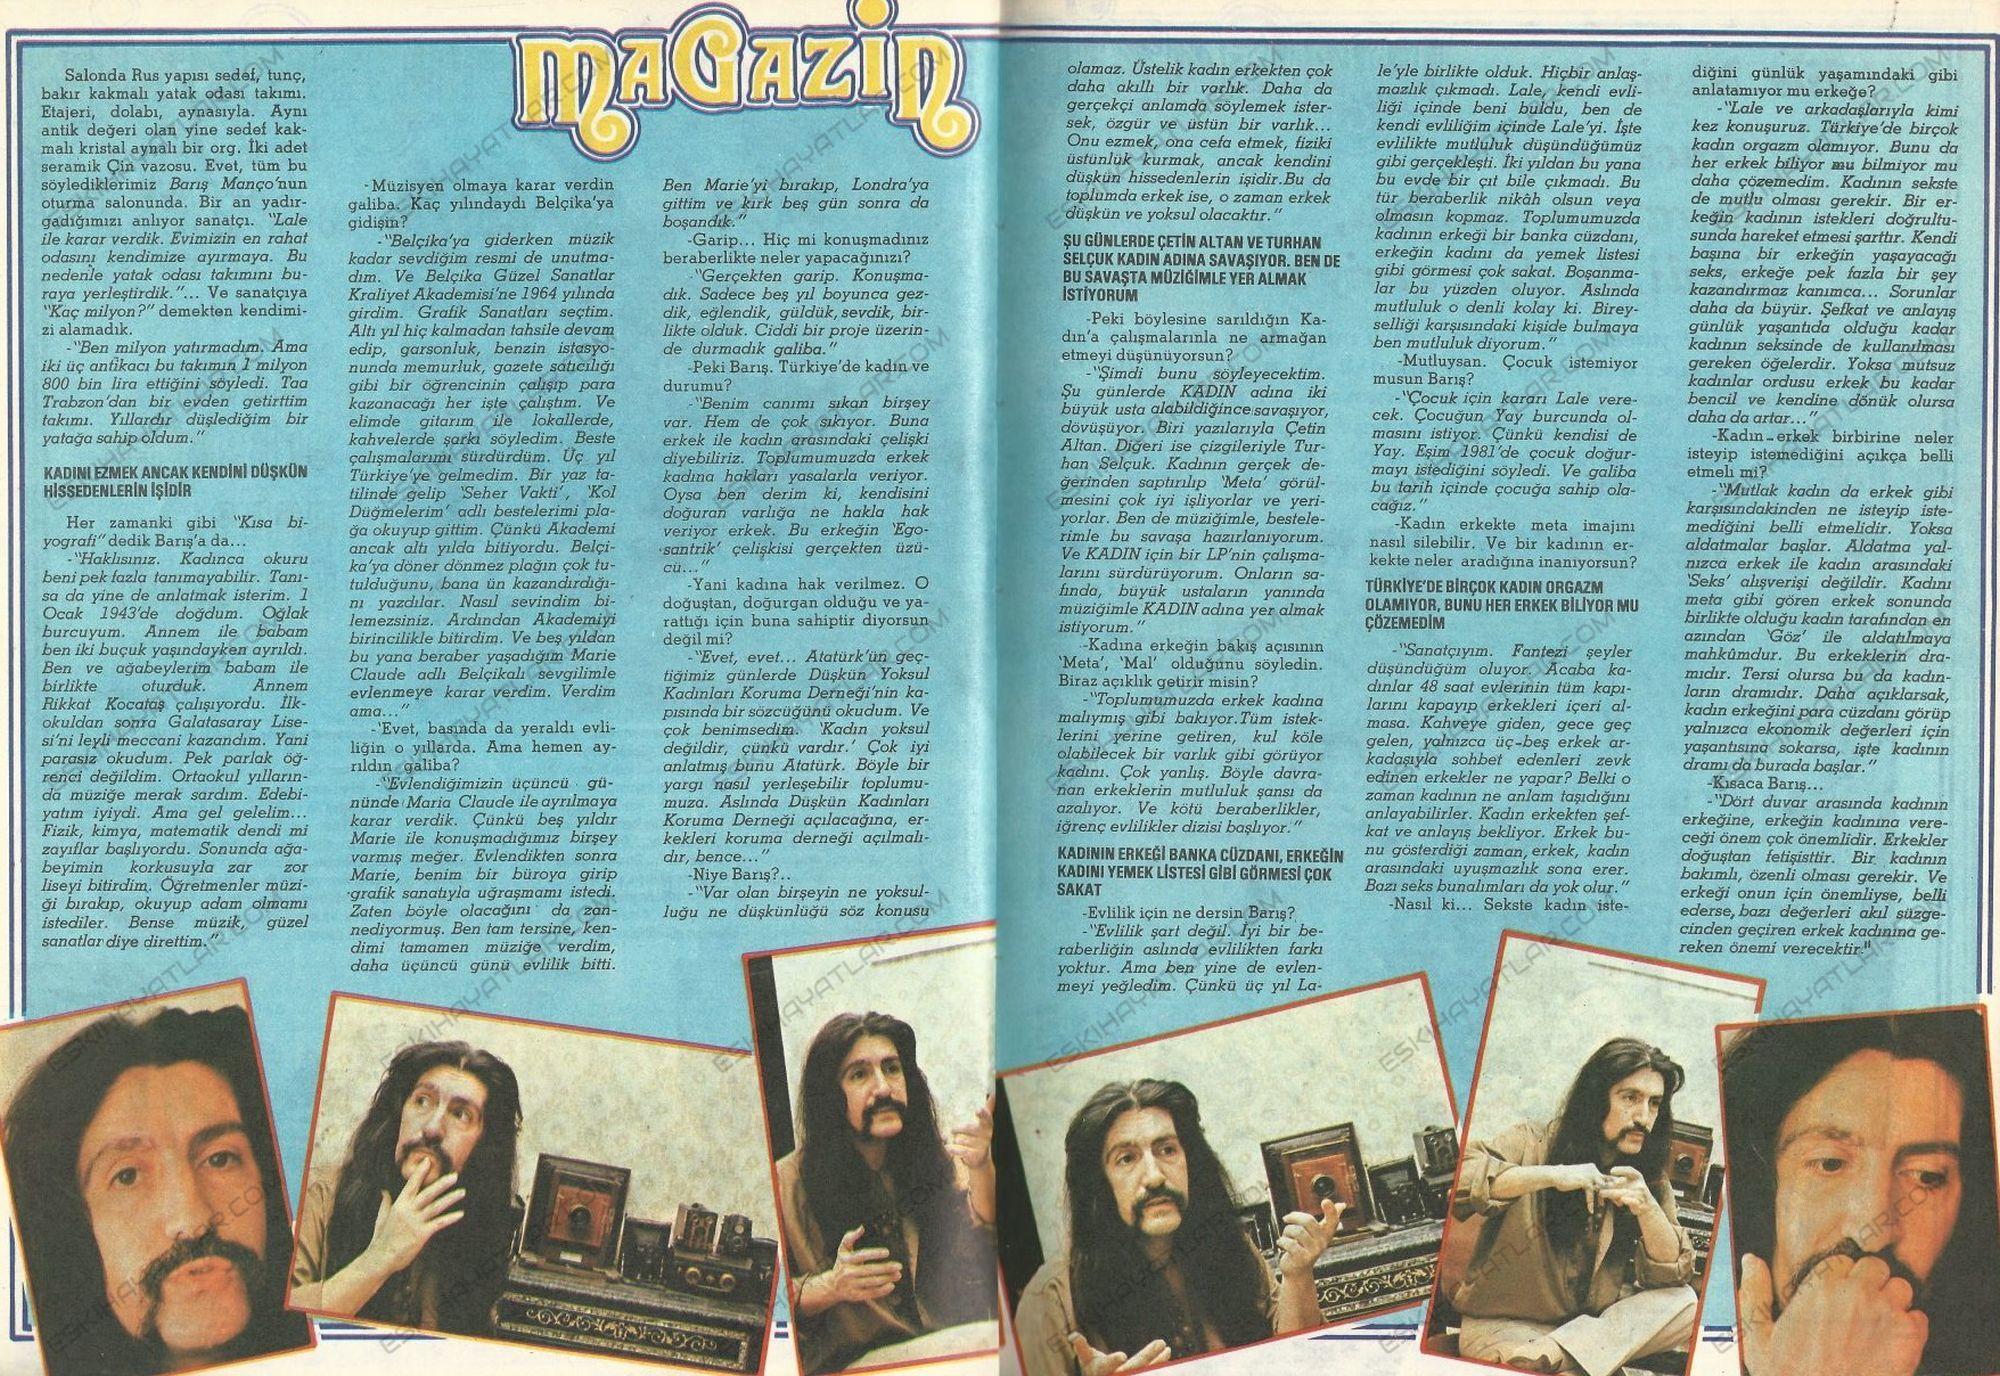 baris-manco-roportaji-1980-kadinca-dergisi-arsivleri (1)